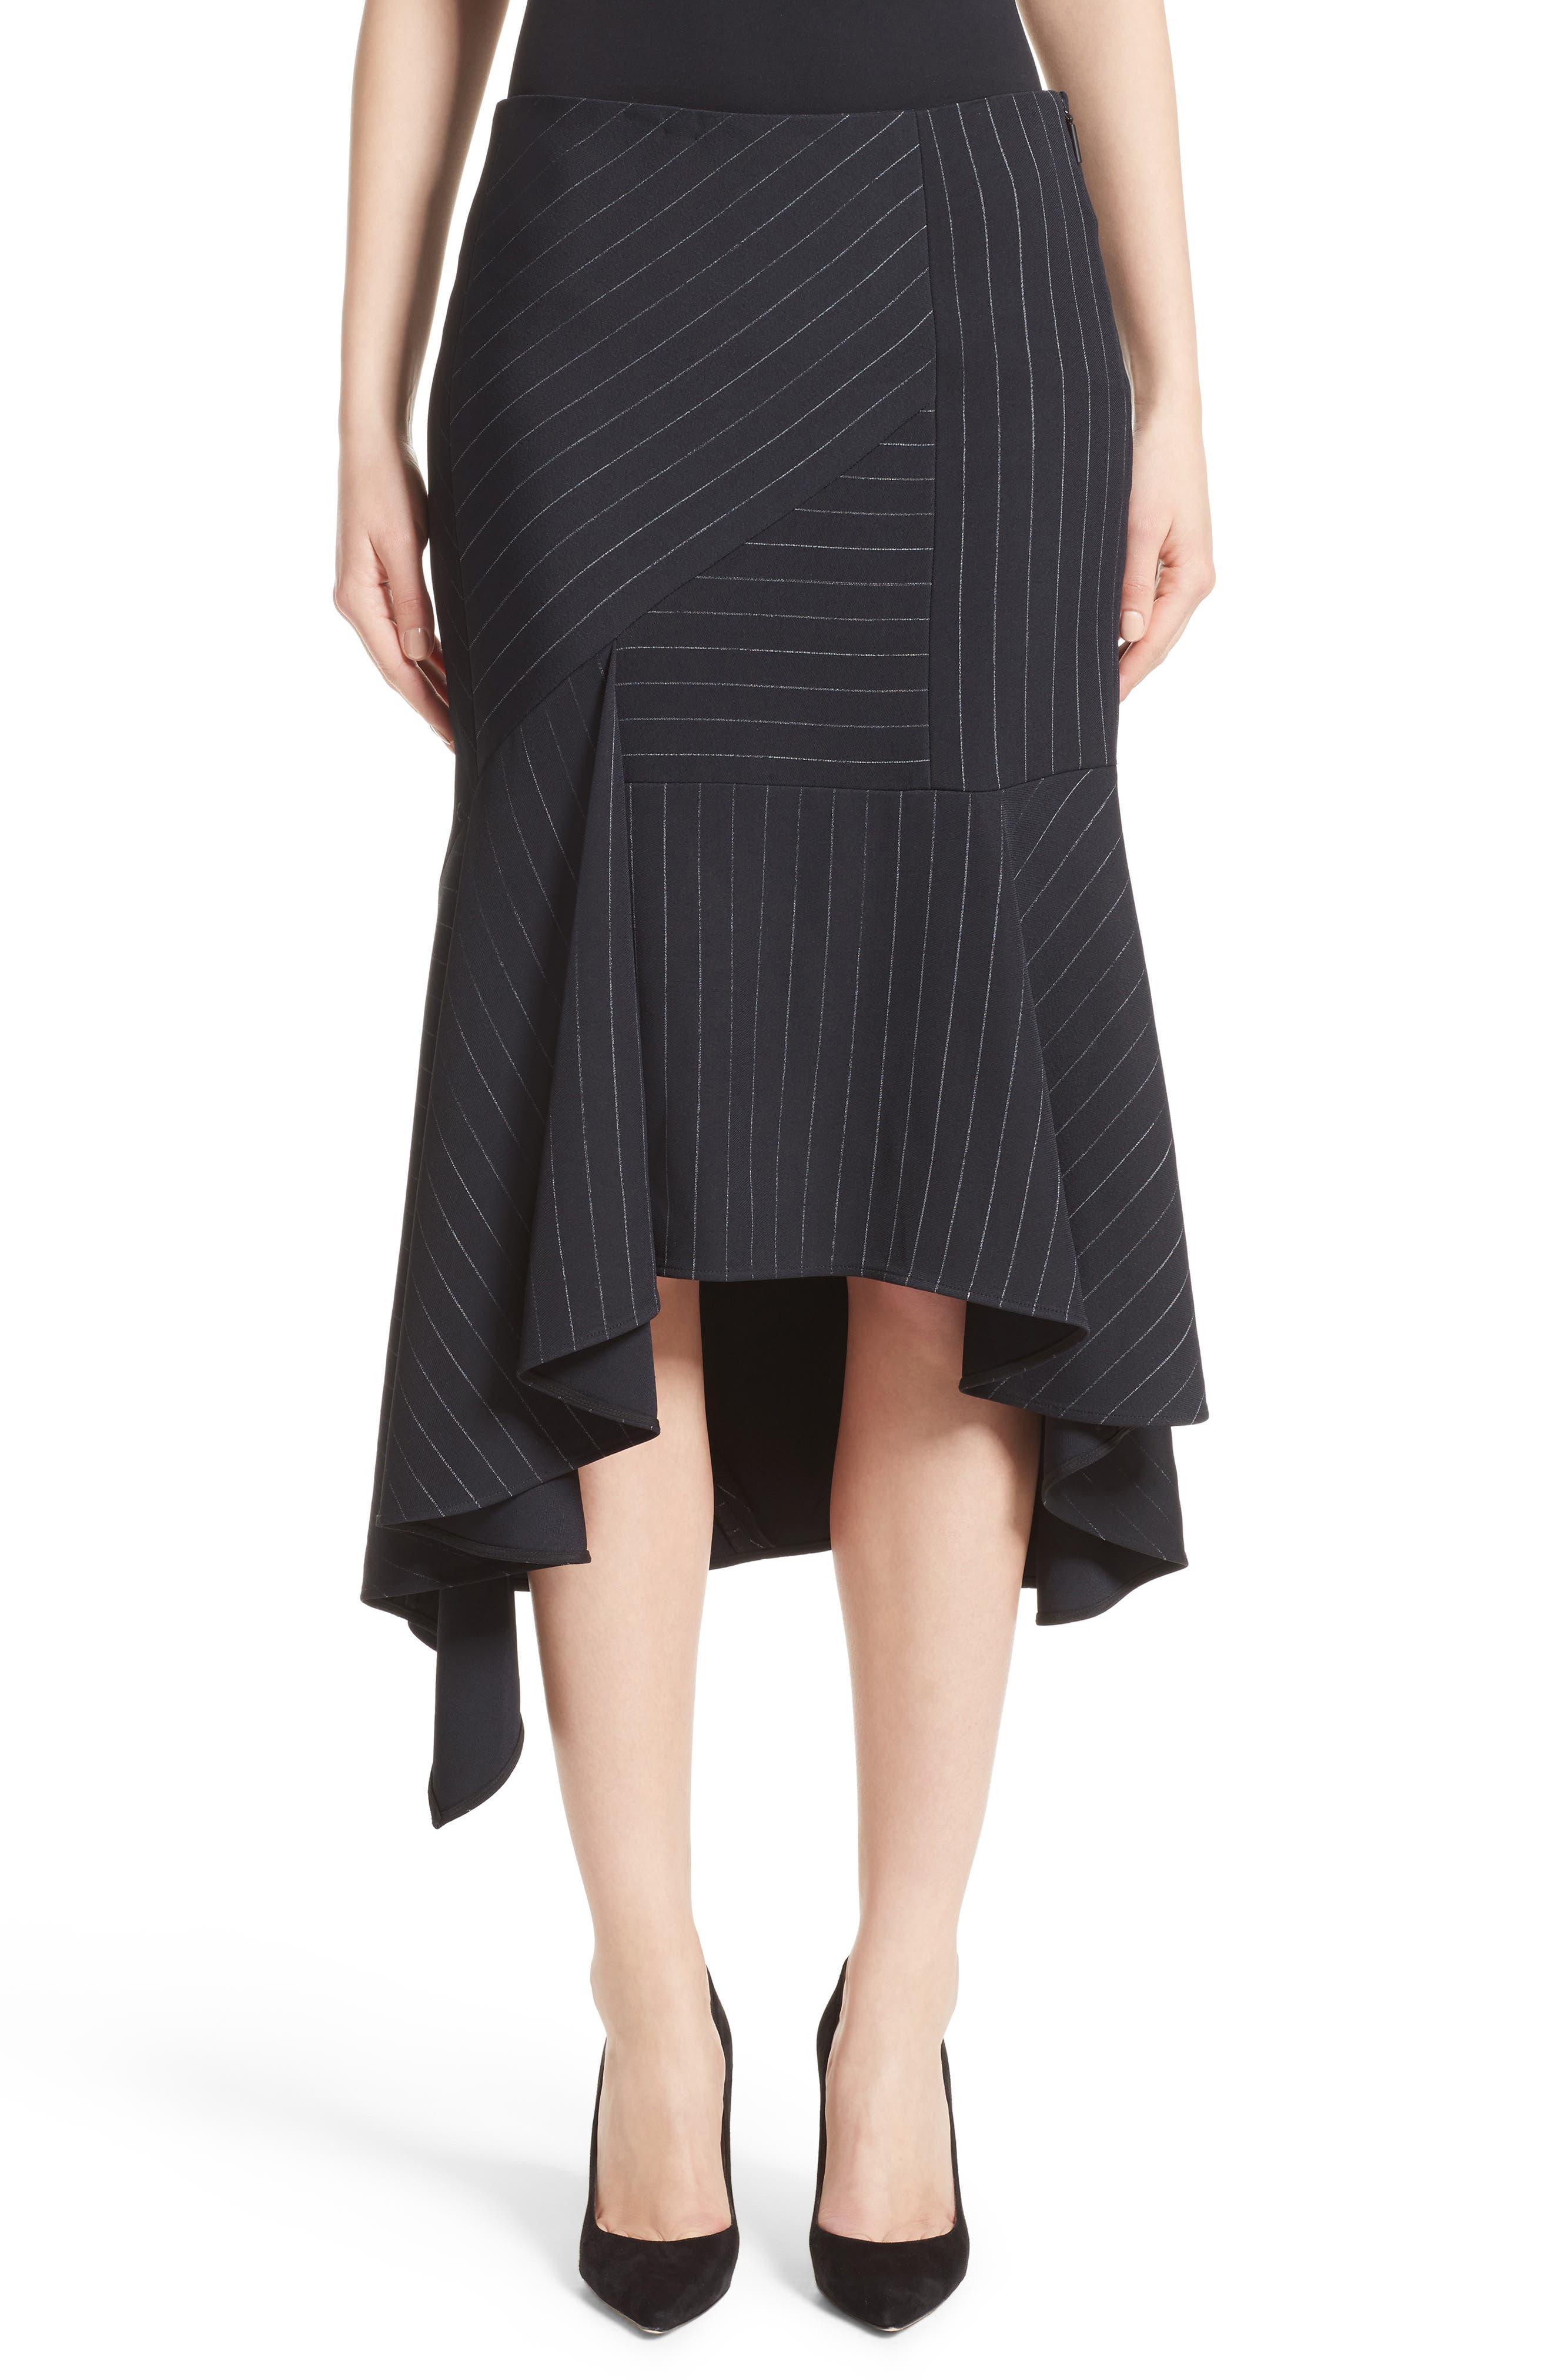 Alternate Image 1 Selected - Jason Wu Pinstripe Stretch Asymmetrical Skirt